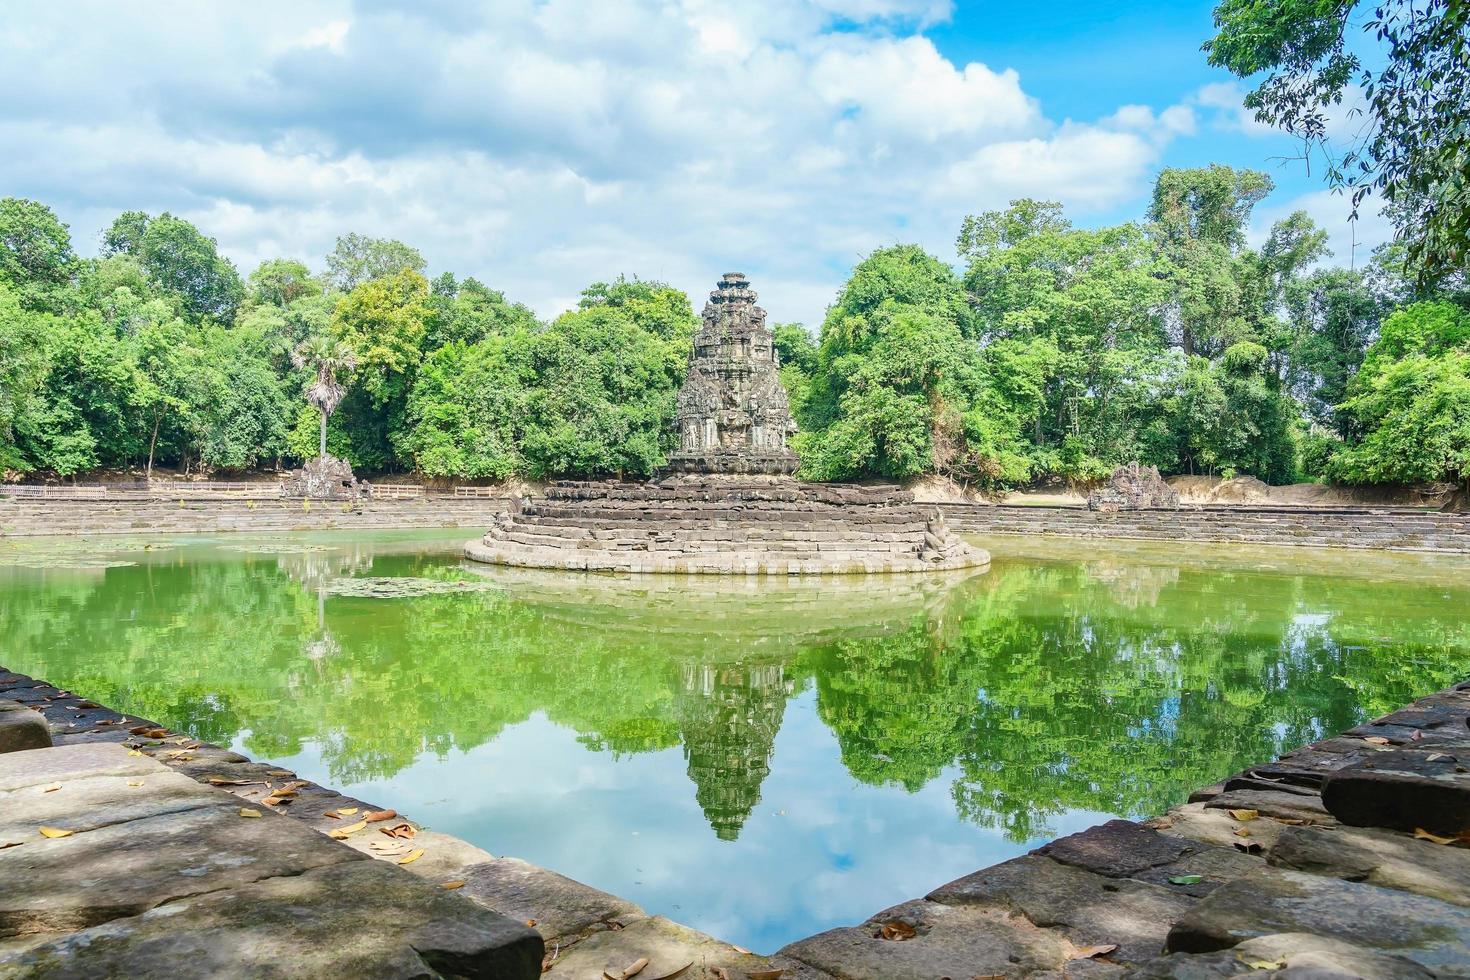 preah neak pean a siem reap, cambogia foto